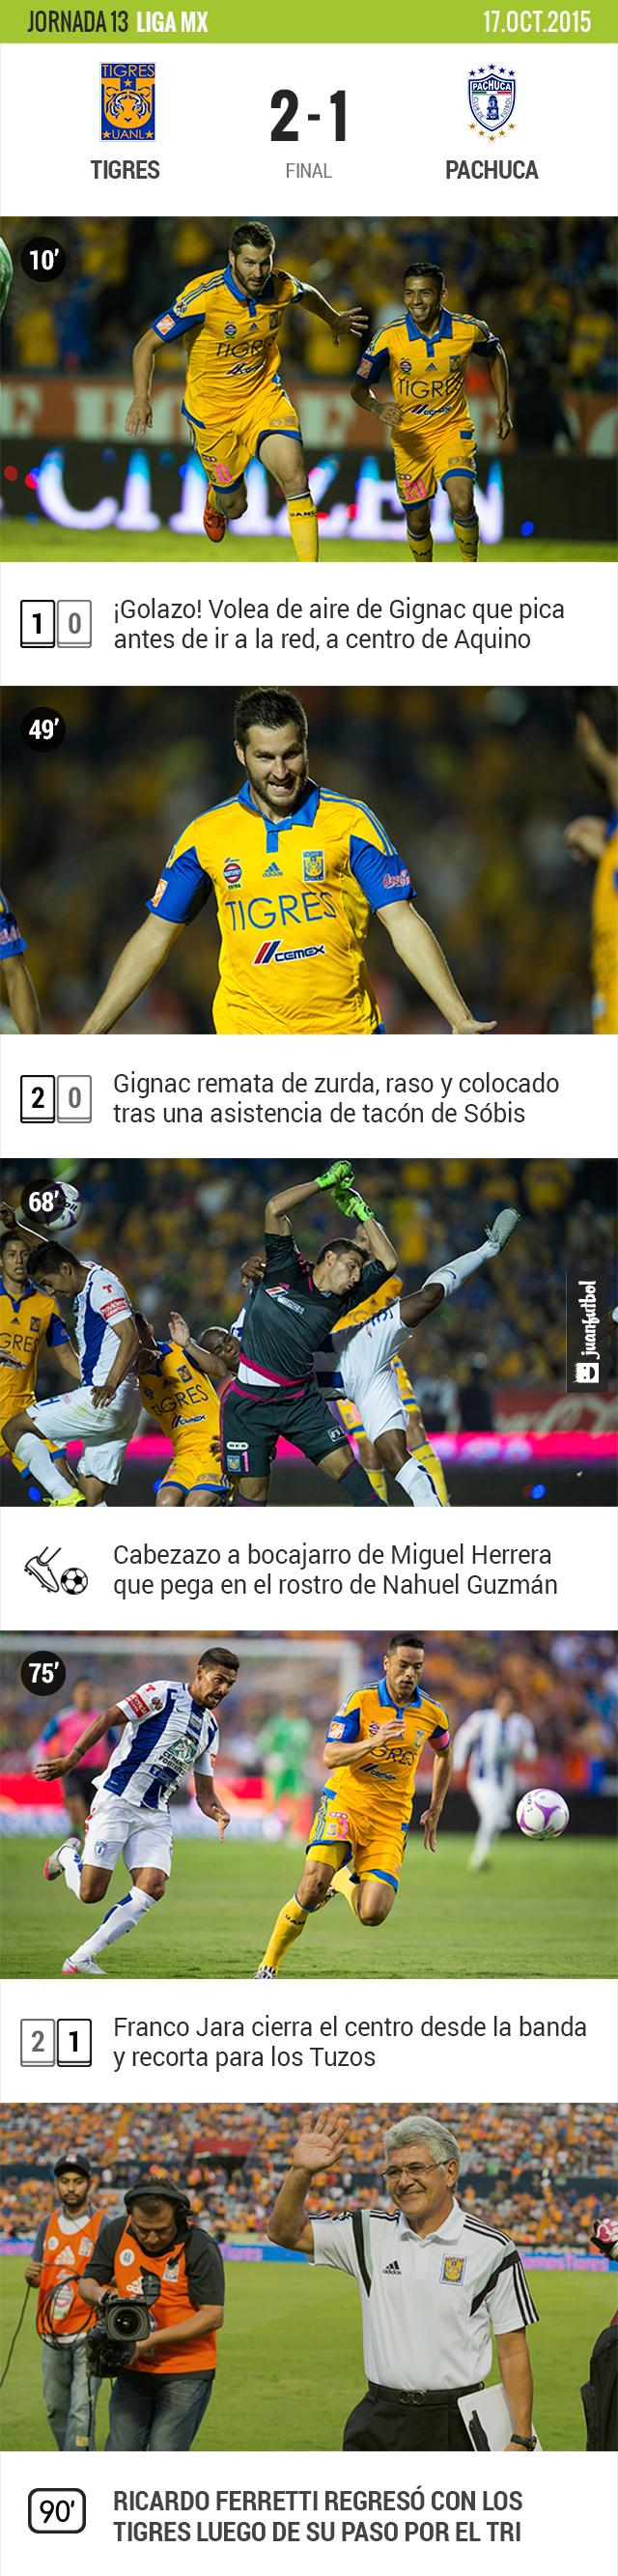 Tigres 2-1 Pachuca